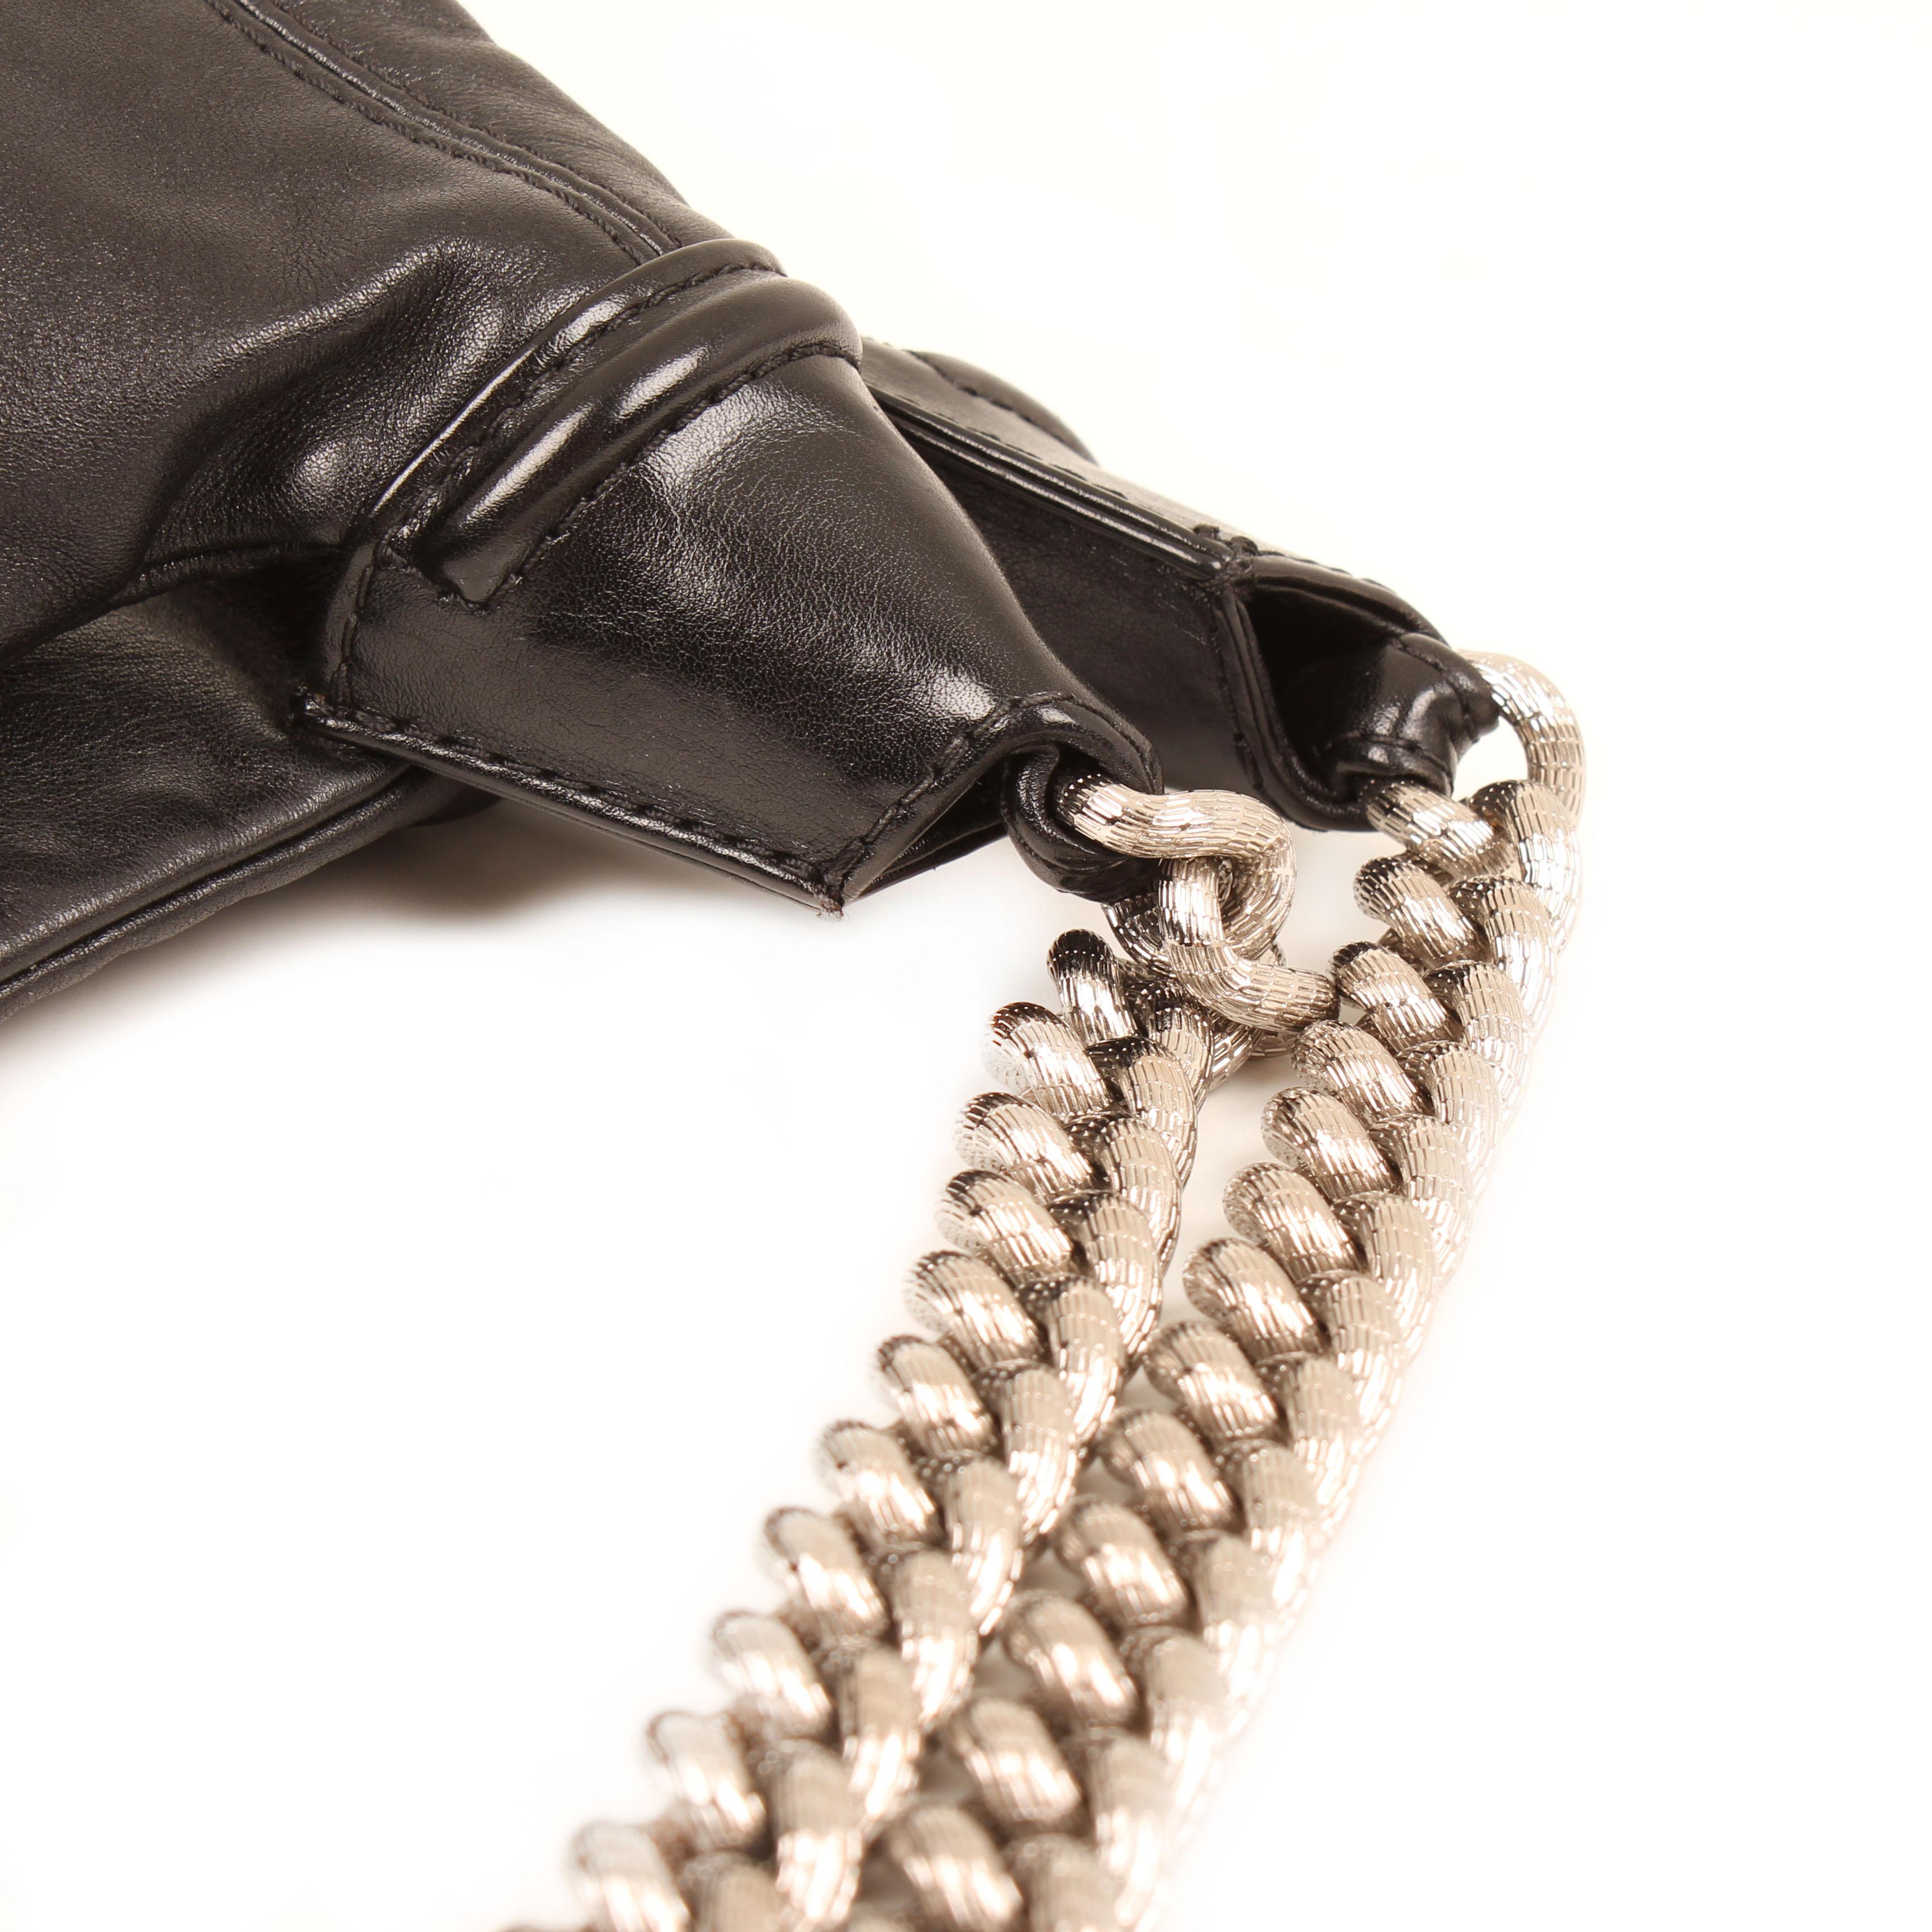 bolso chanel rodeo drive hobo piel becerro negro cadena